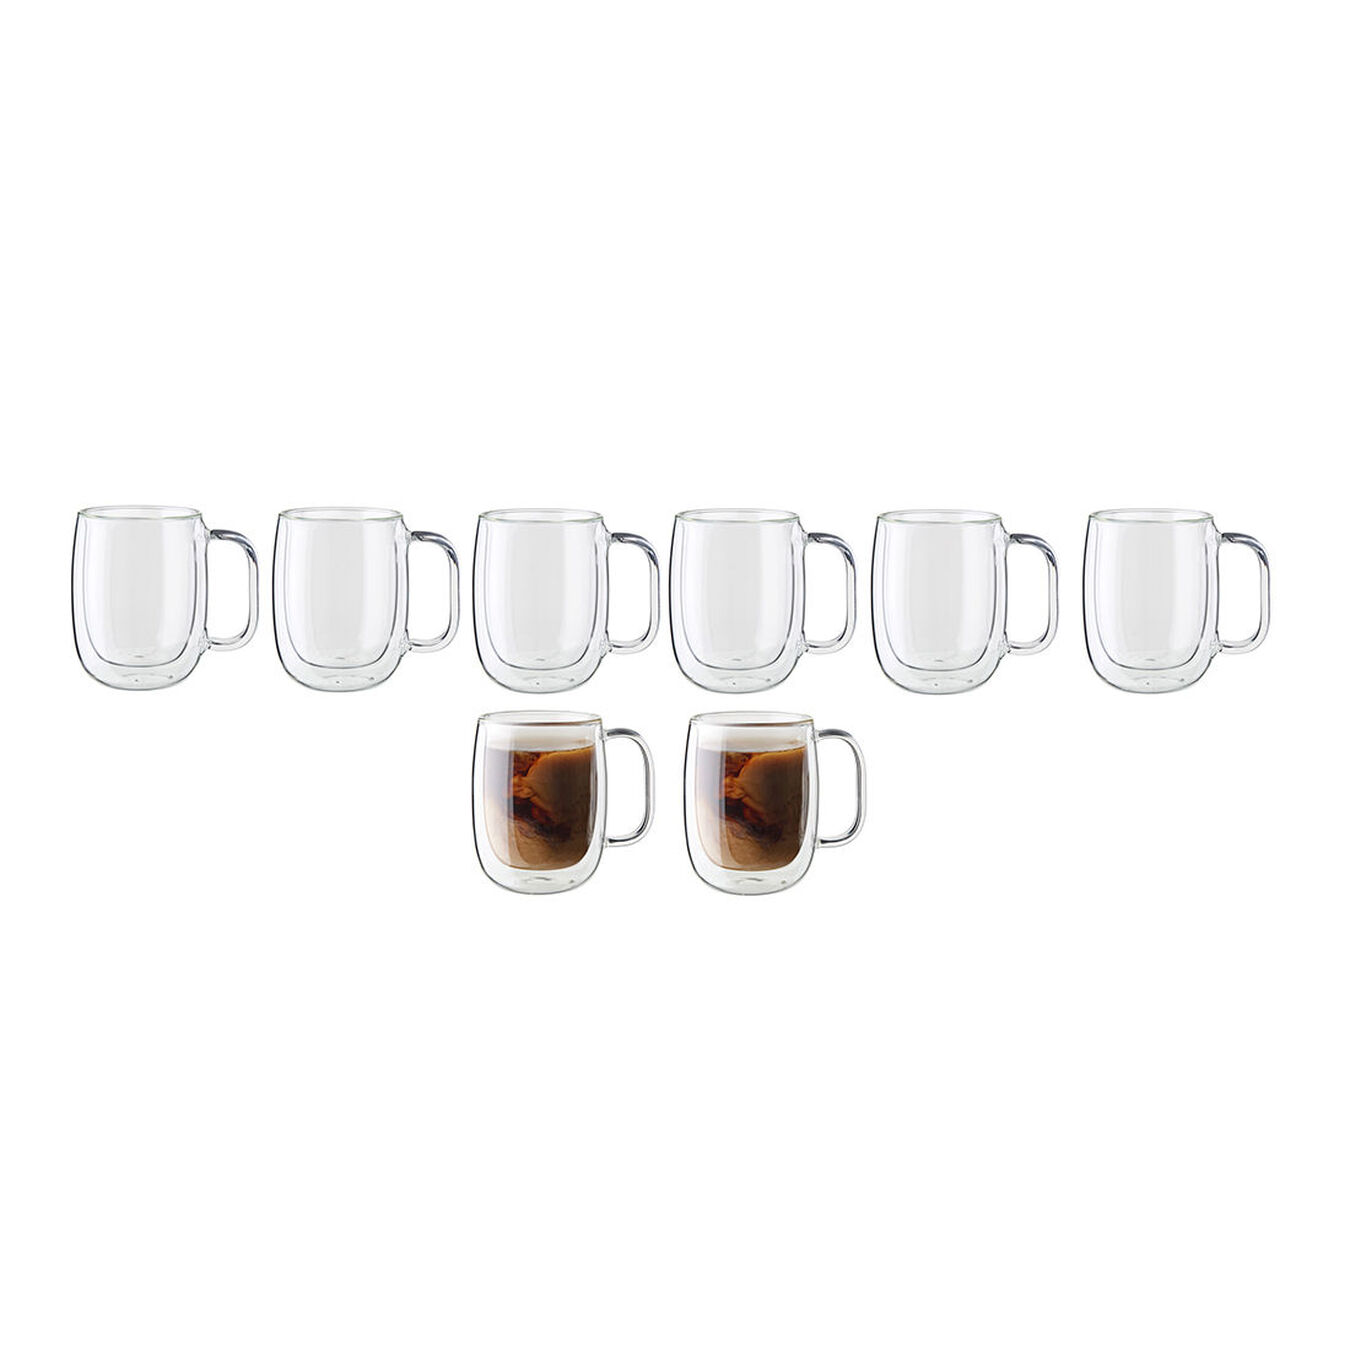 8-pc Double-Wall Glass Coffee Mug Set,,large 3